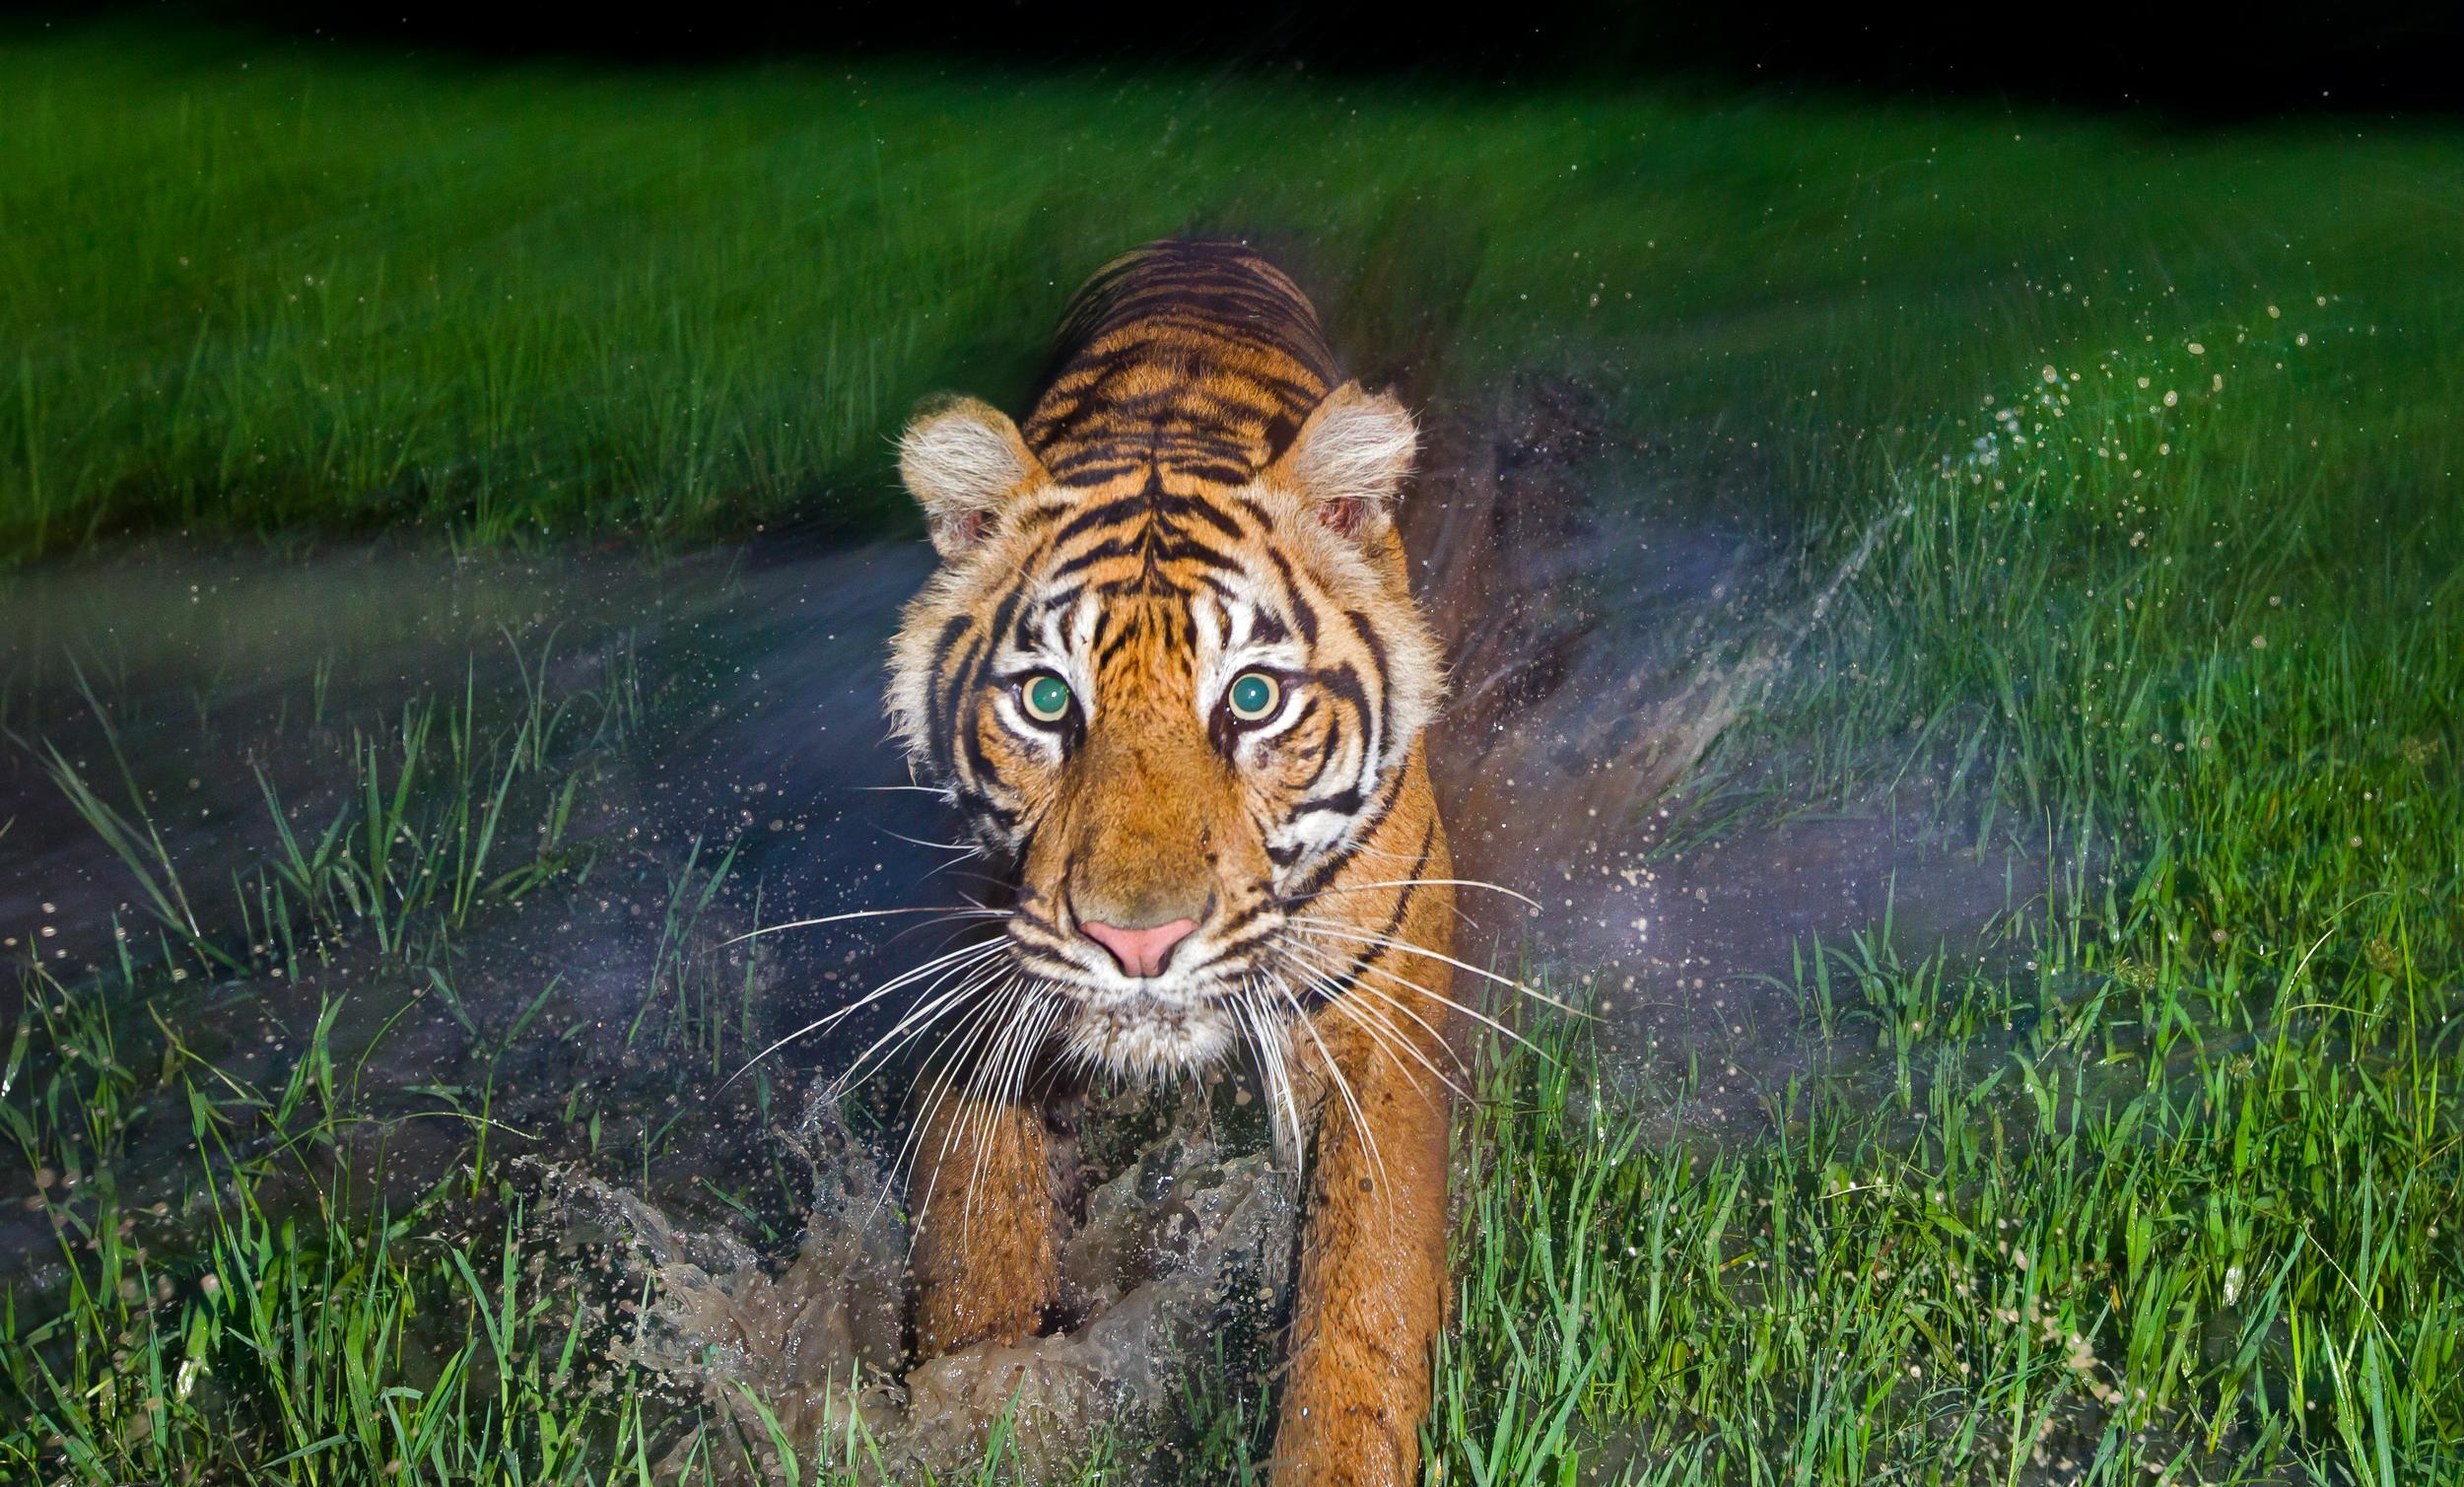 Bright, green eyed tiger in twilight